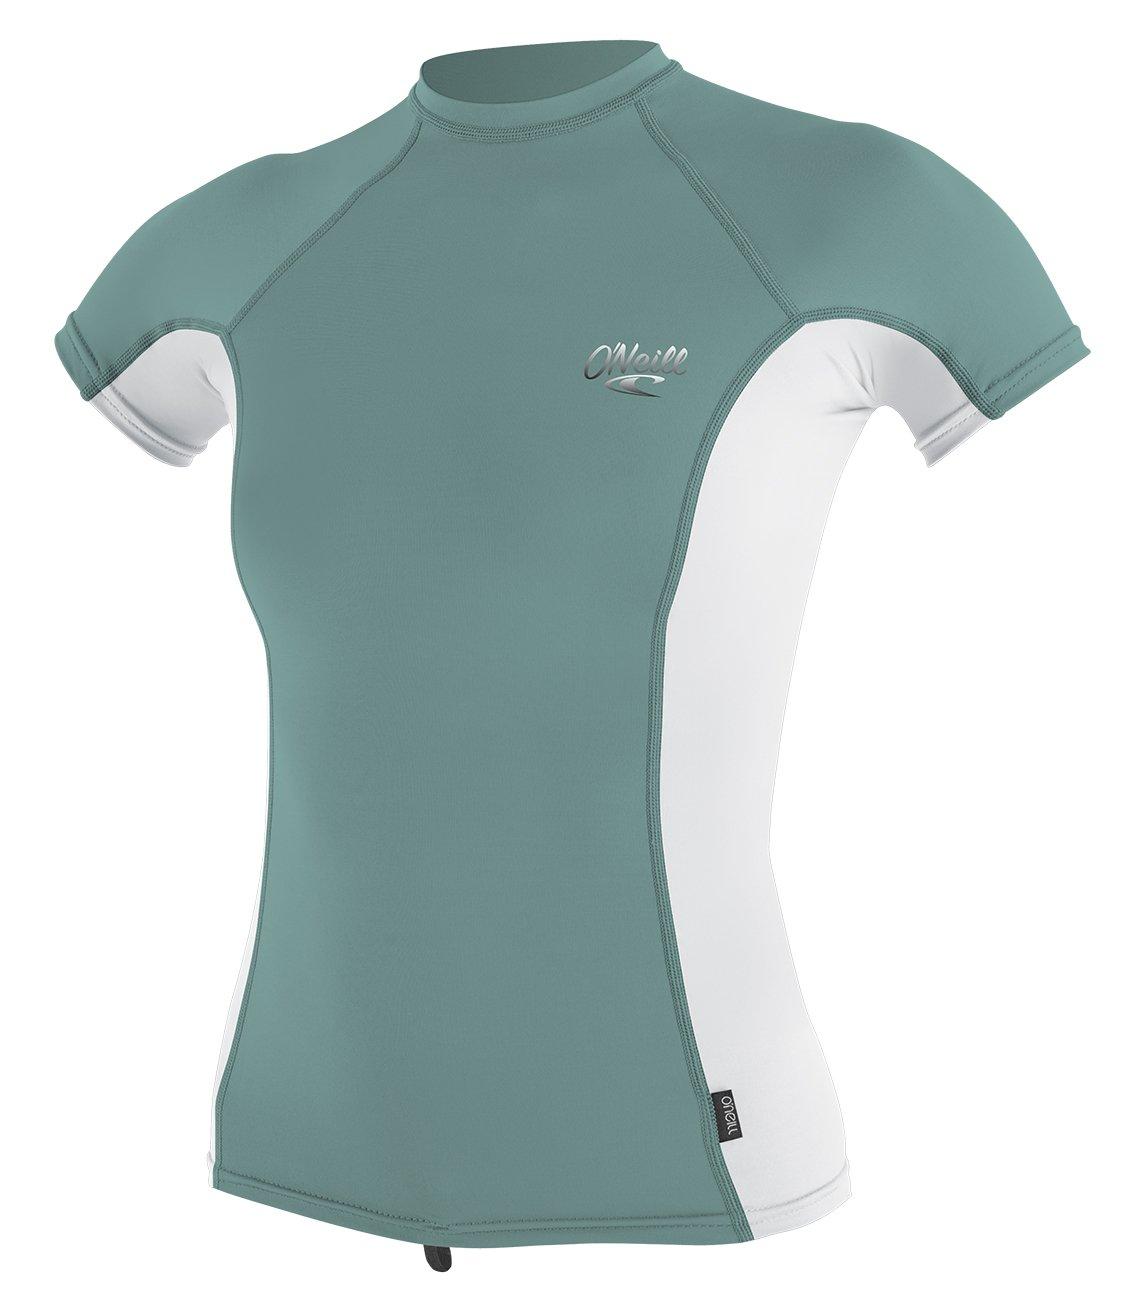 O'Neill Women's Premium Skins UPF 50+ Short Sleeve Rash Guard, AquaHaze/White, X-Small by O'Neill Wetsuits